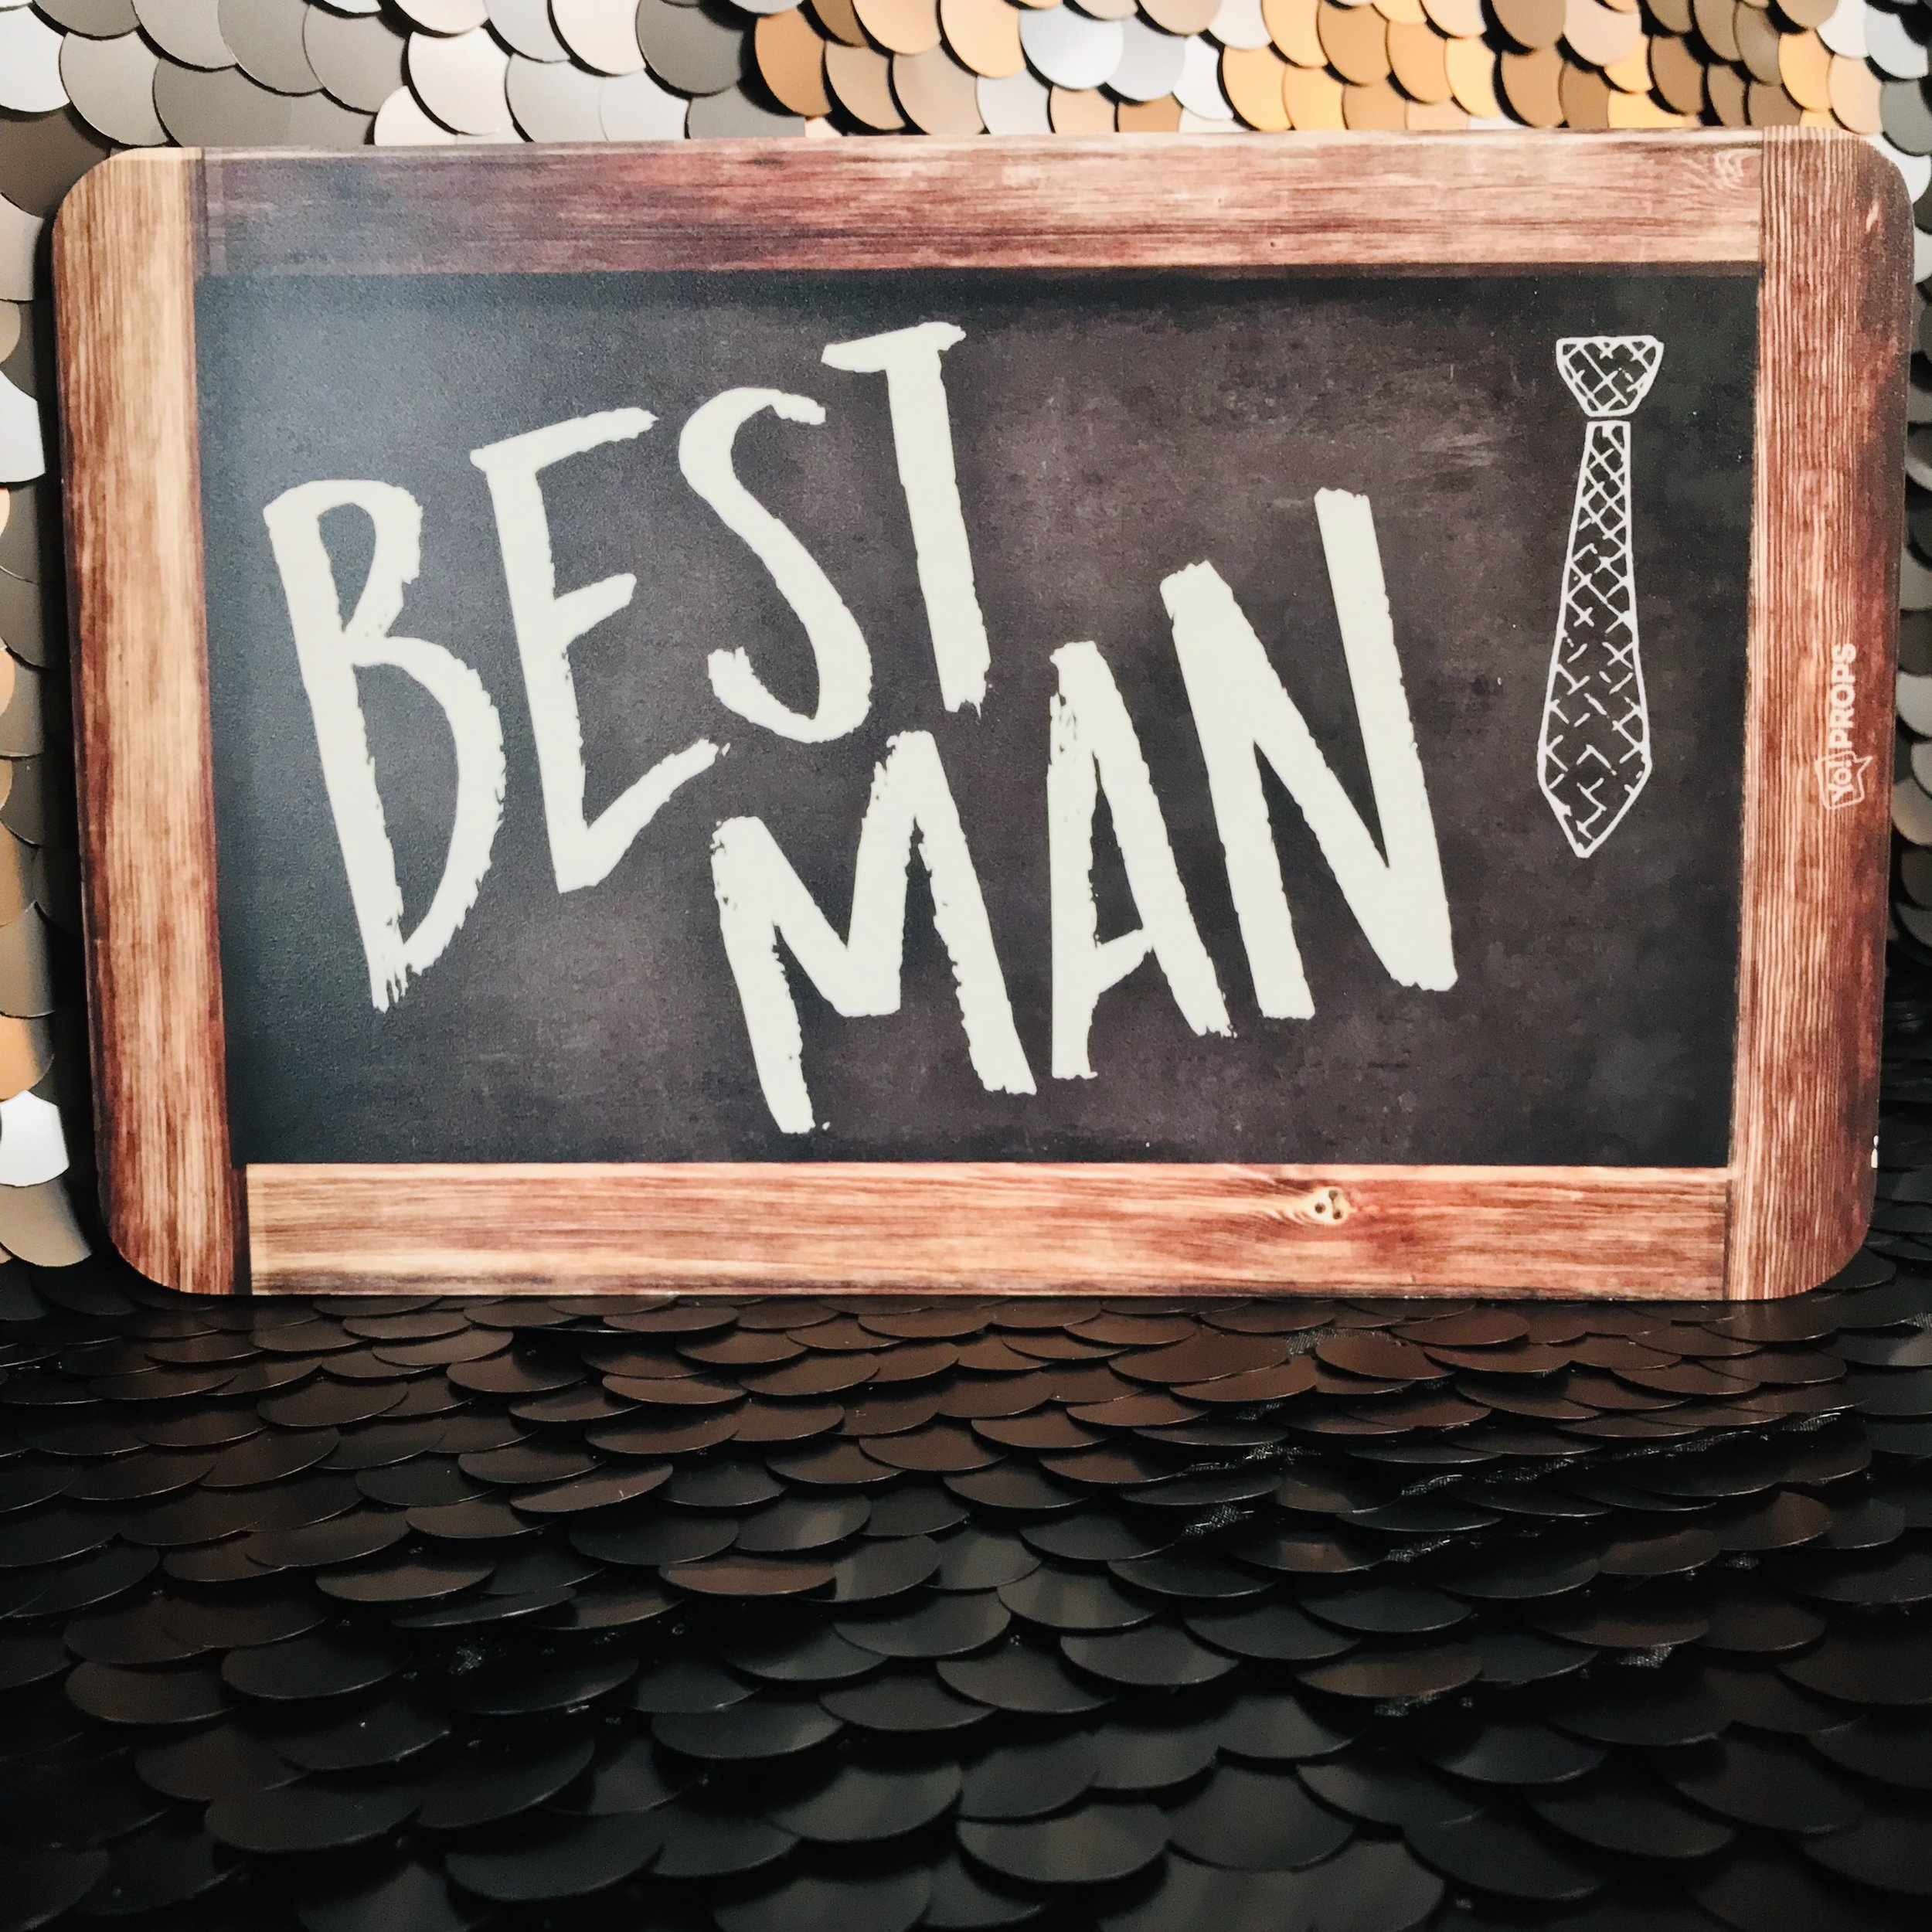 Best Man.jpg